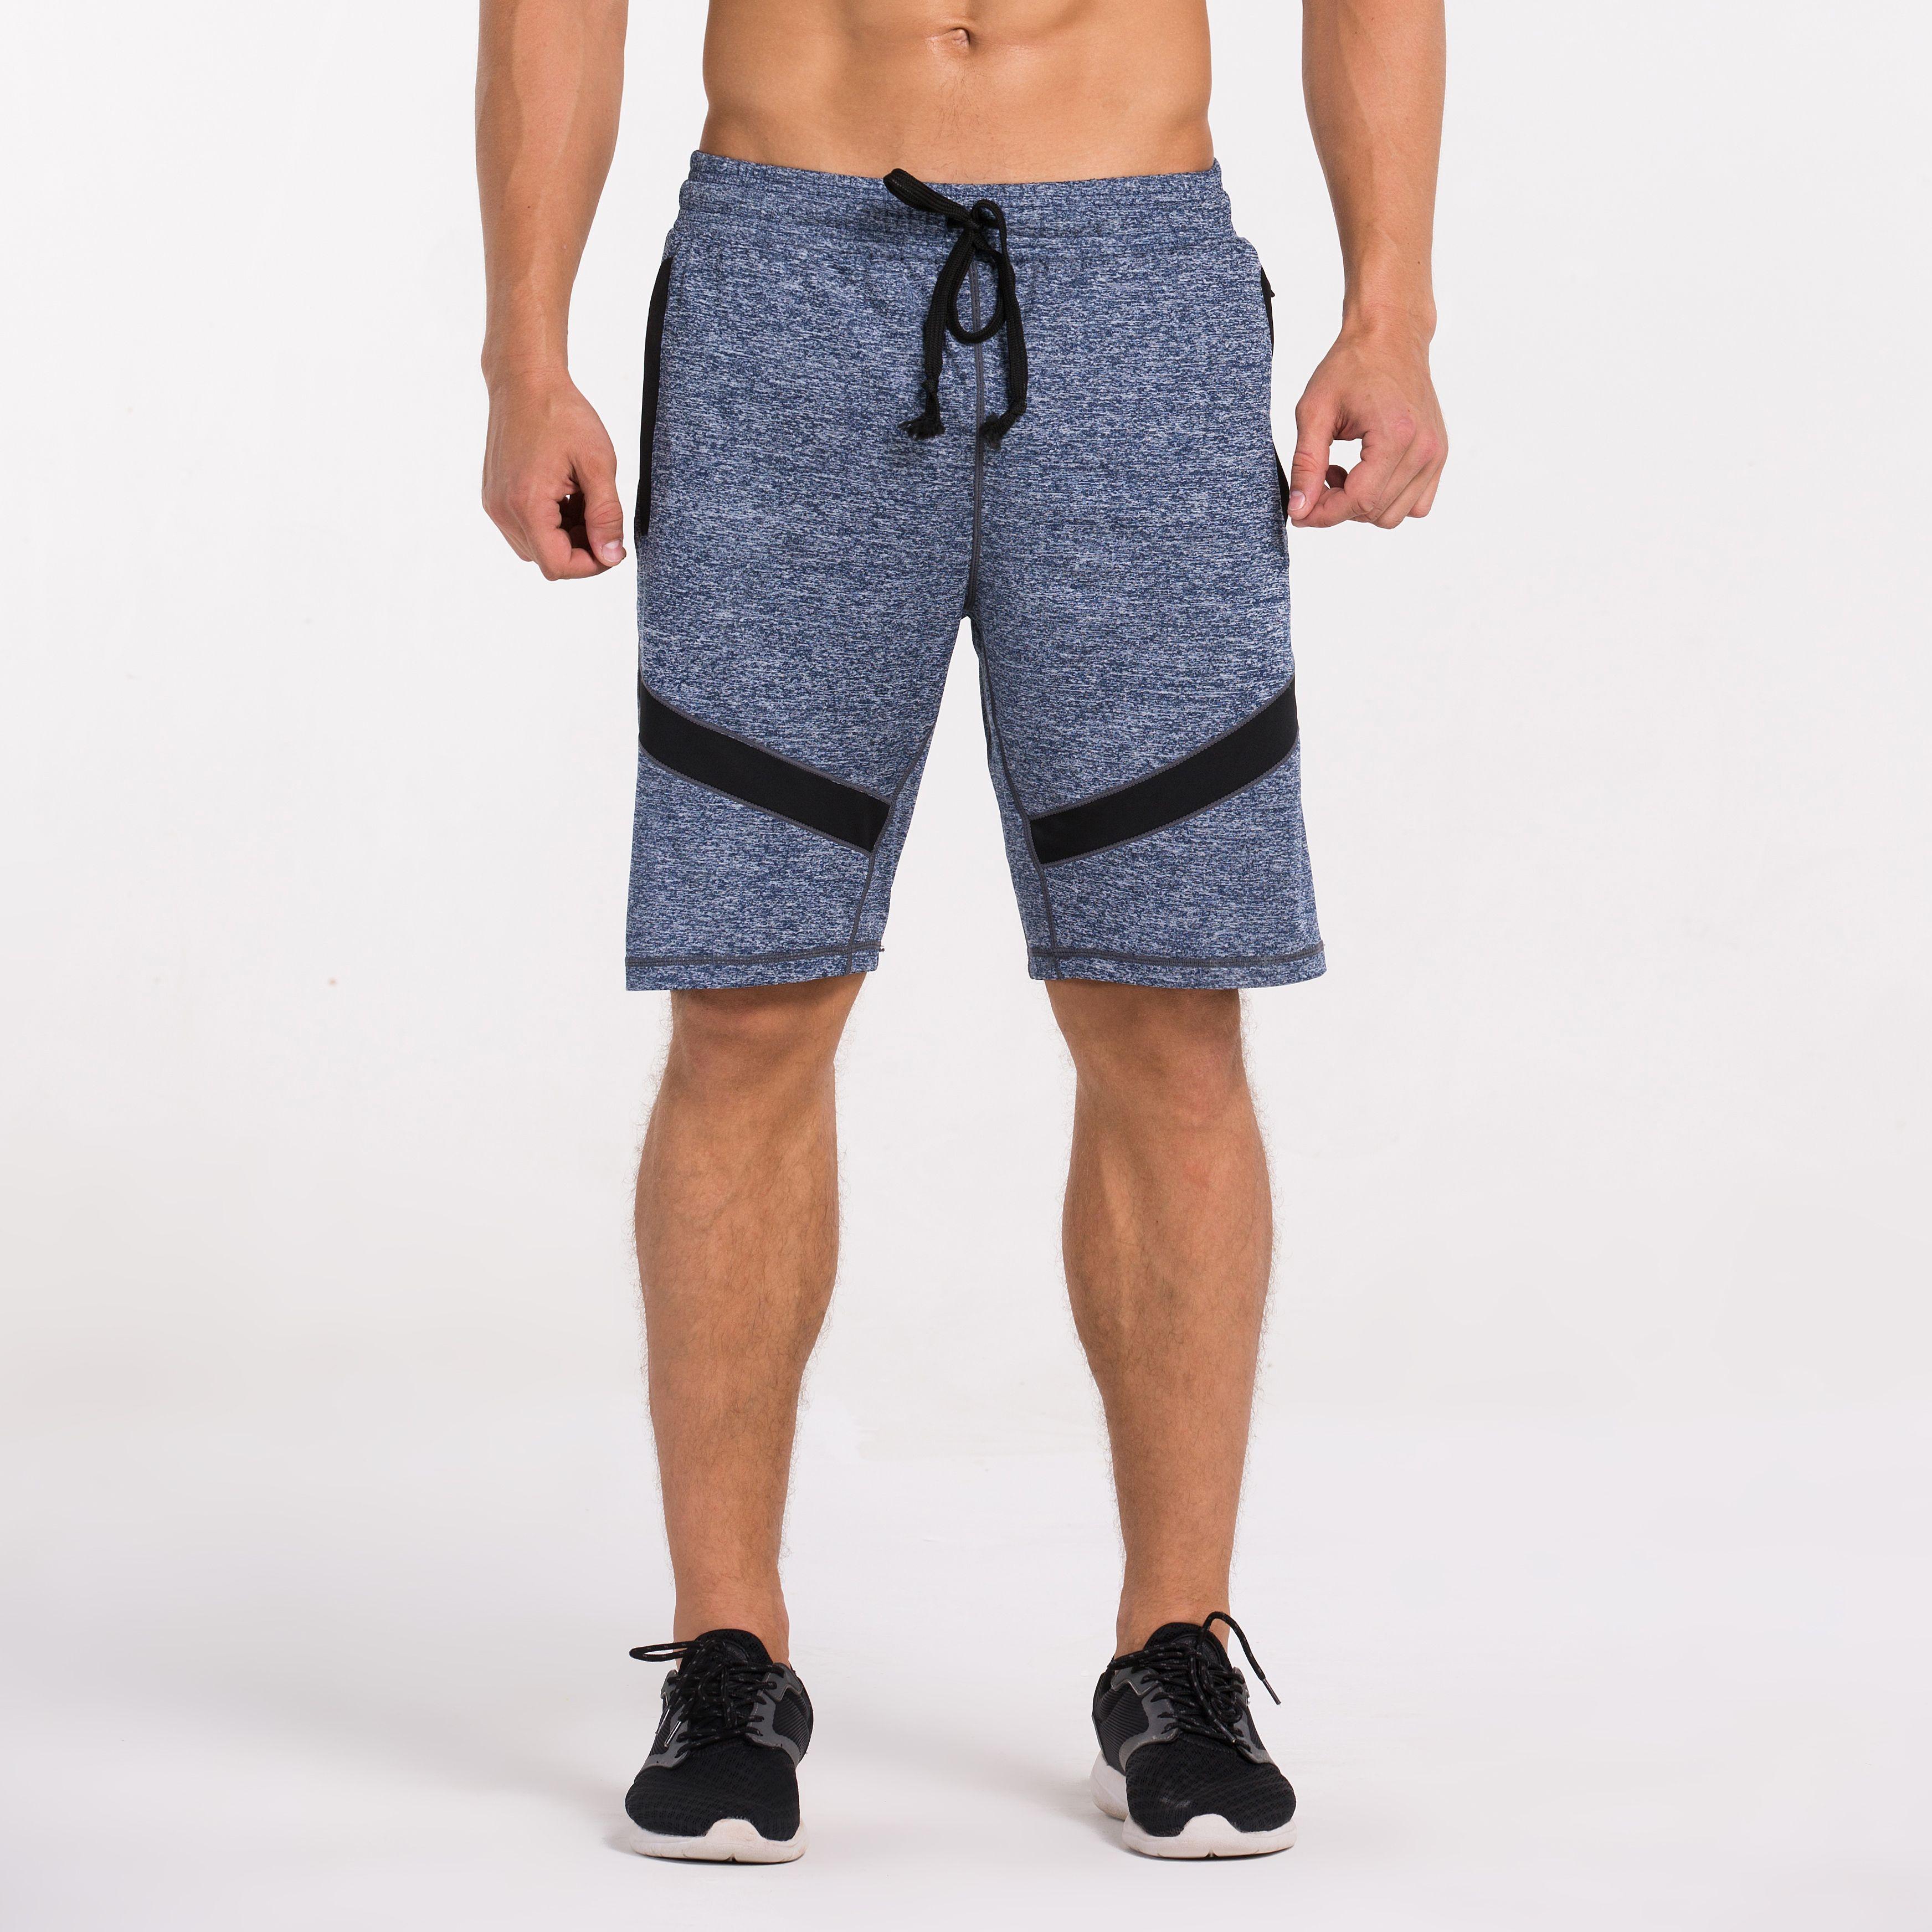 Men Sports Running Run Football Shorts Outdoor Fitness Exercise Gym Soccer Basketball Jogging Jogger Boxer Shorts